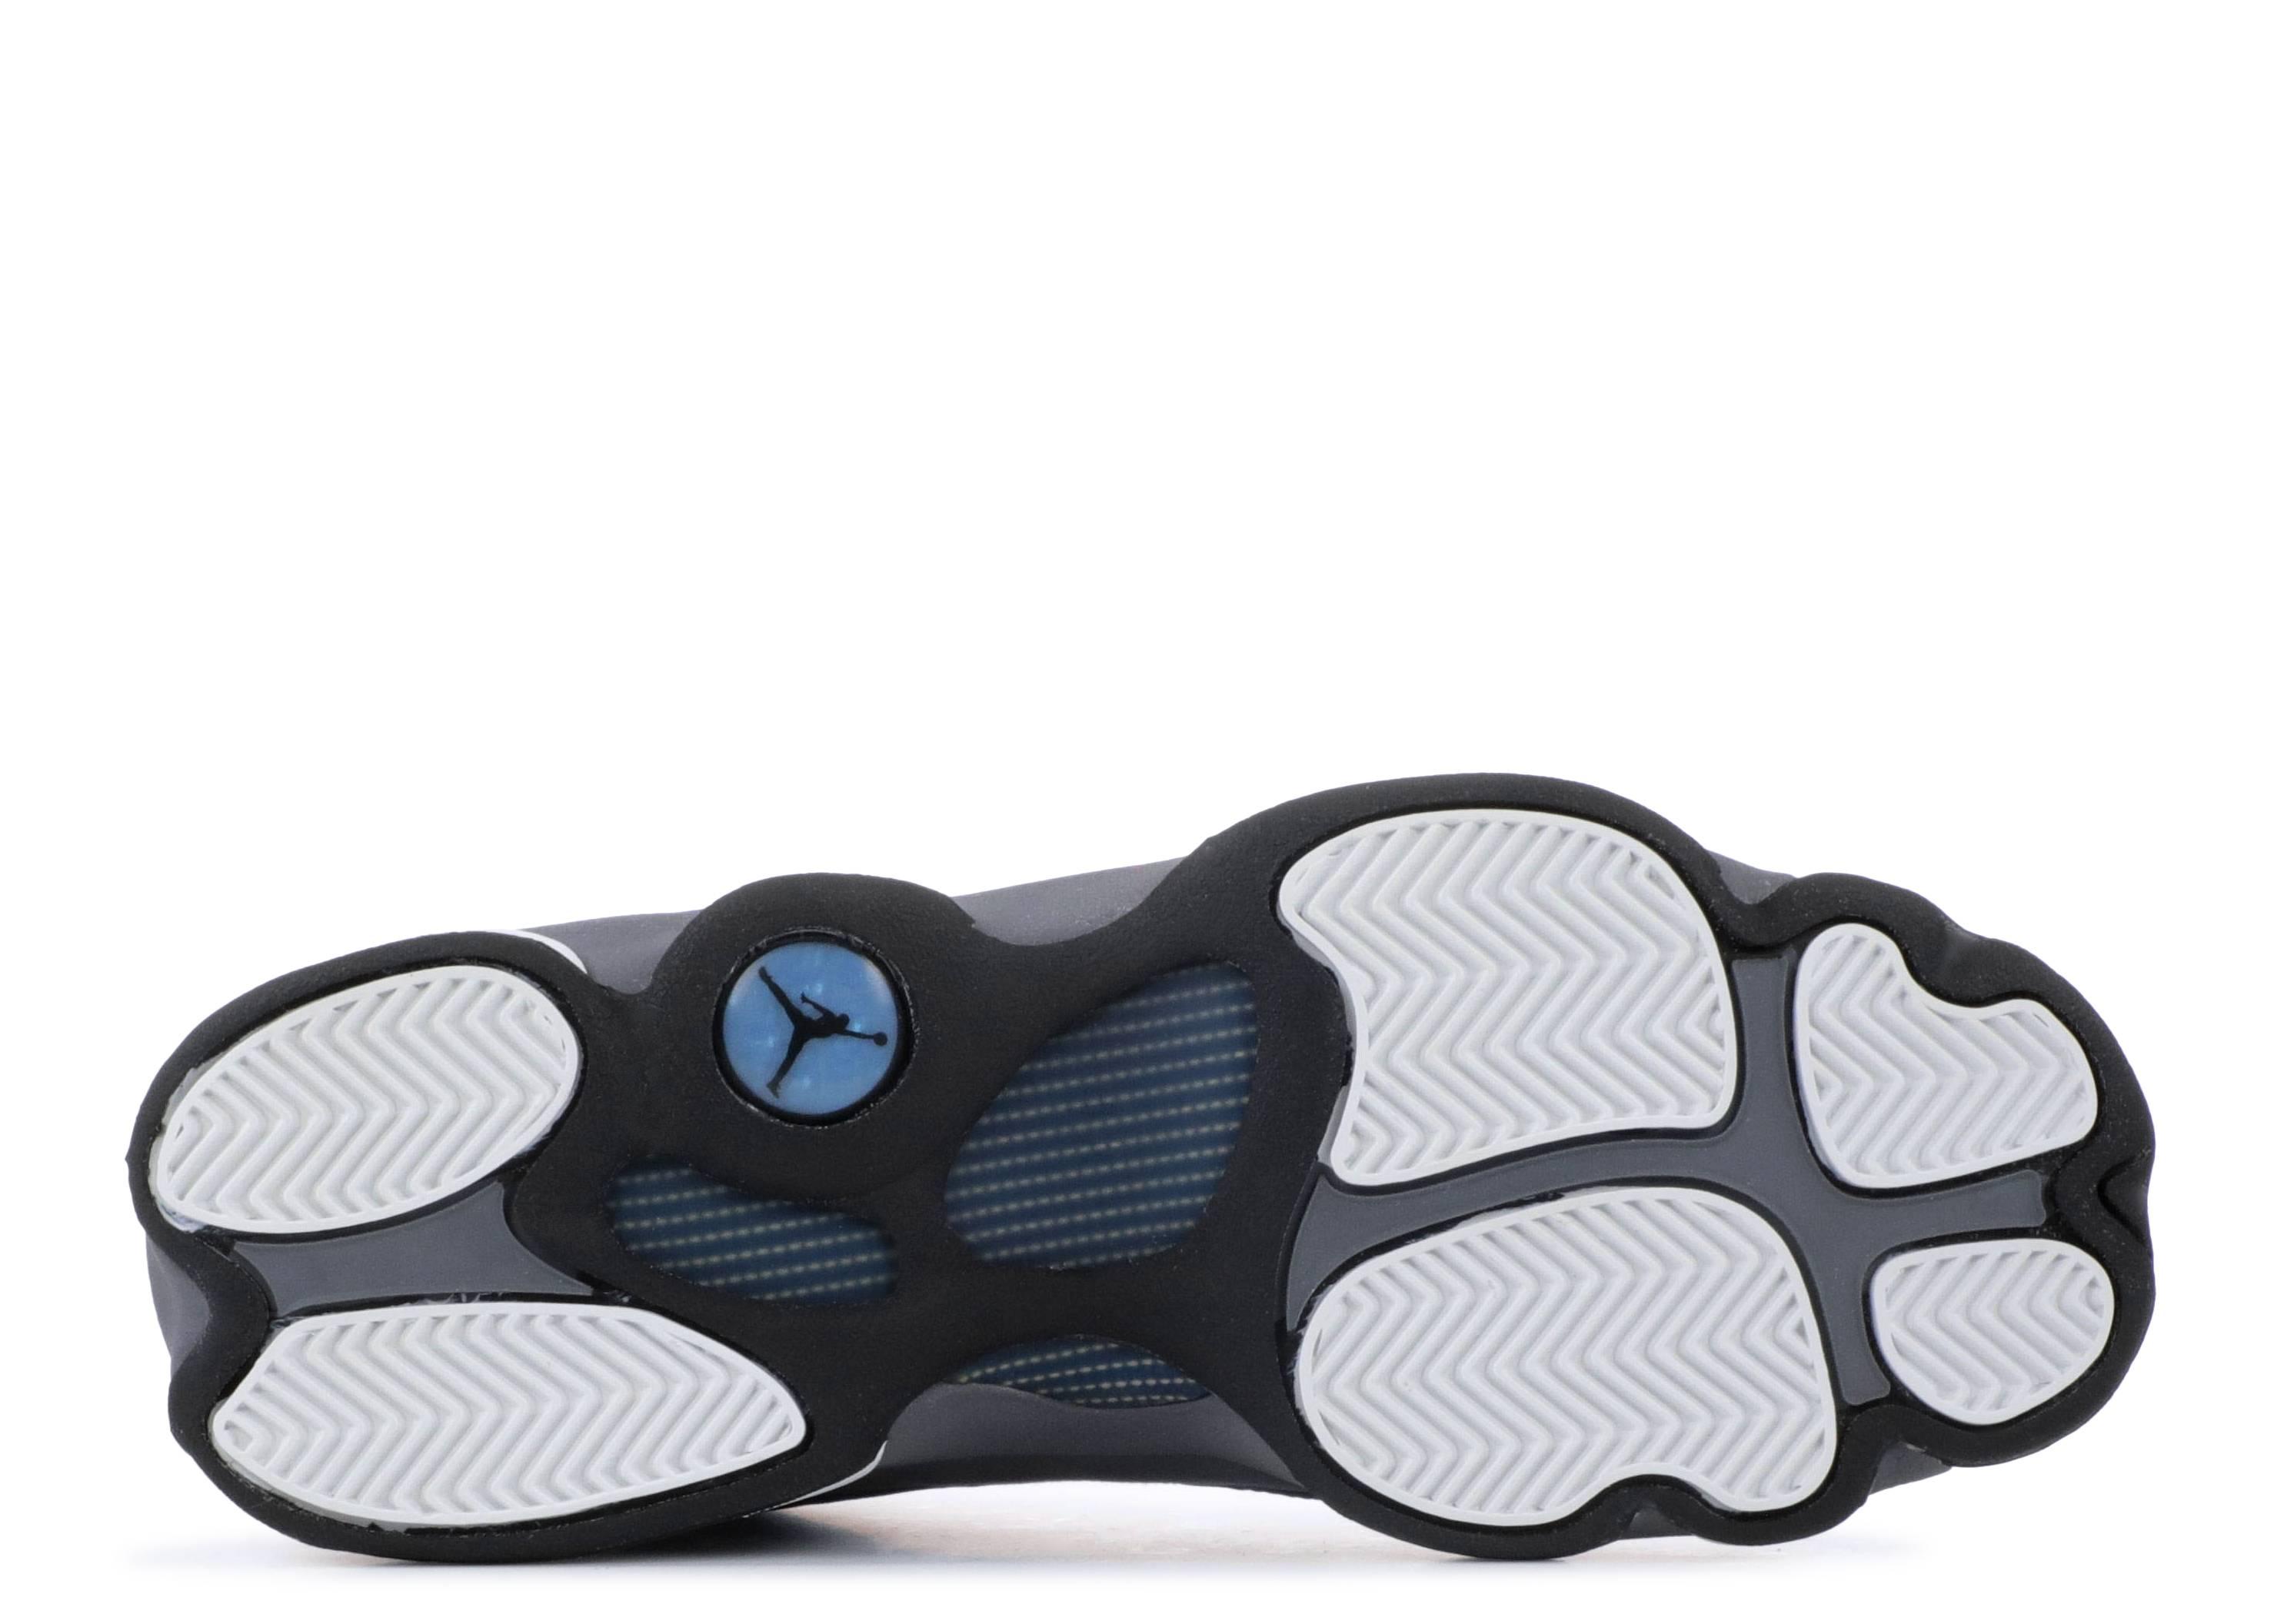 0bb6df3382cf9 Air Jordan Retro 13 (gs) - Air Jordan - 310271 441 - french blue ...